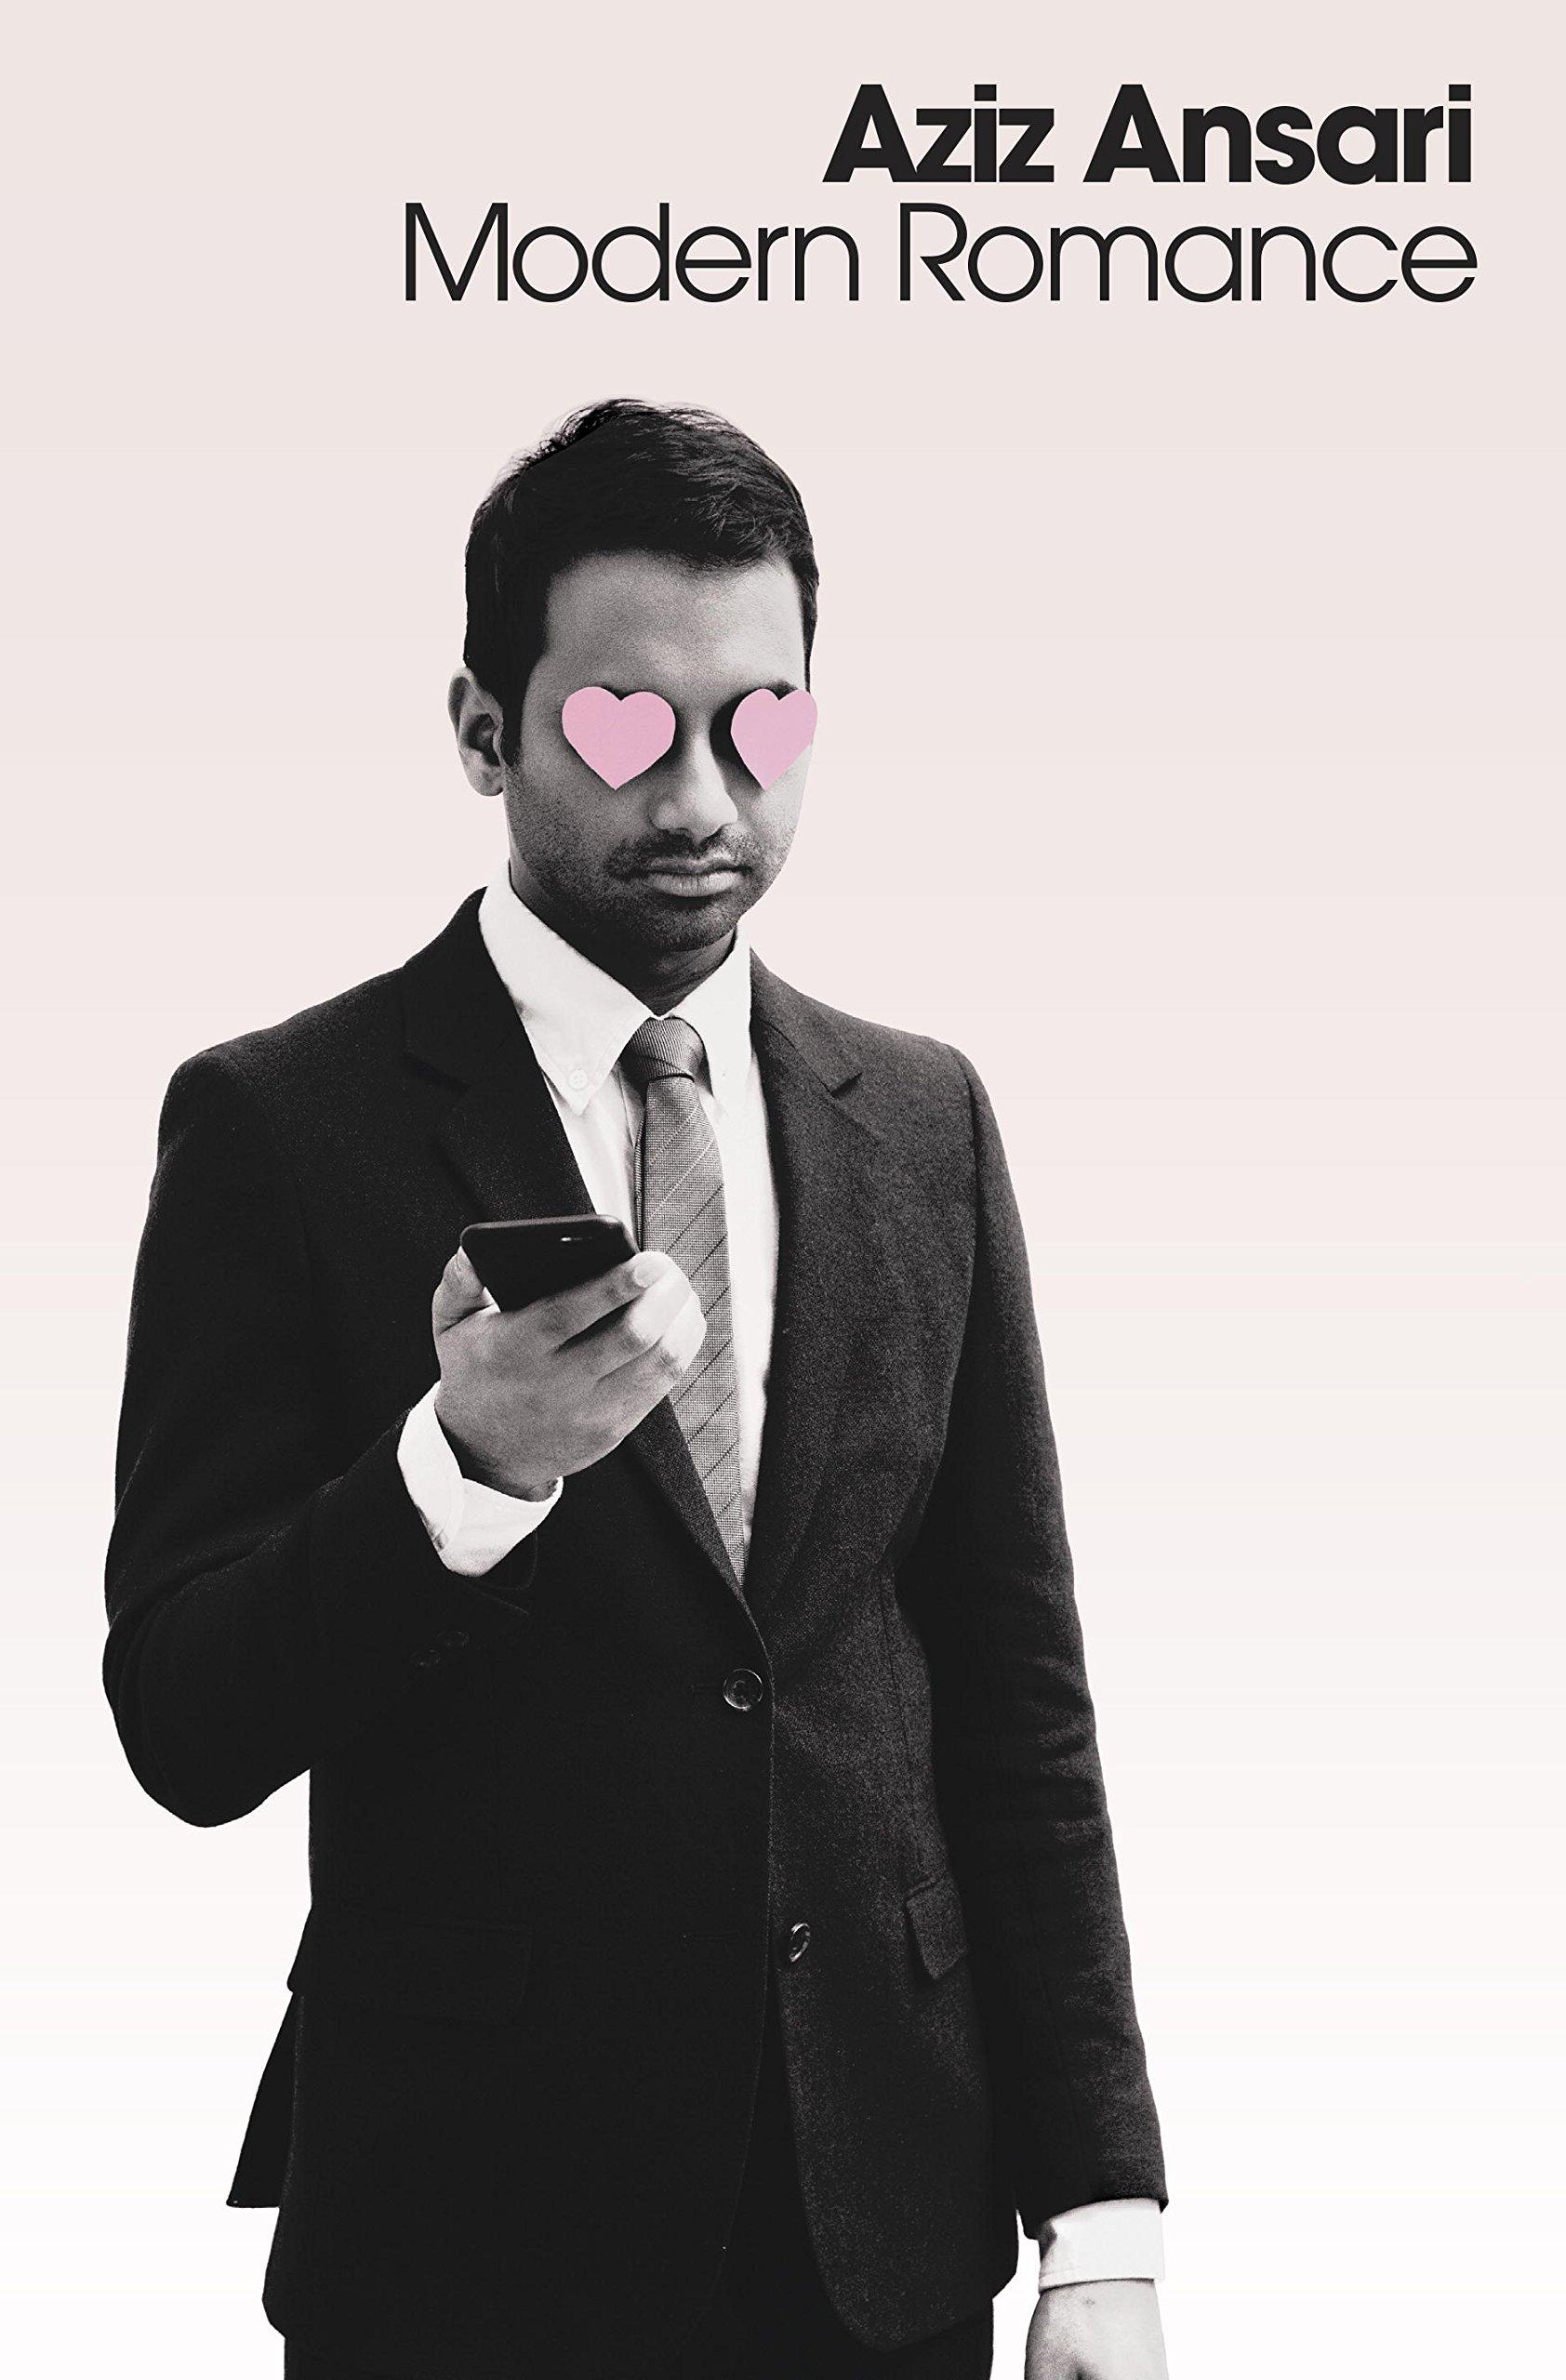 Modern Romance by Aziz Ansari Cover